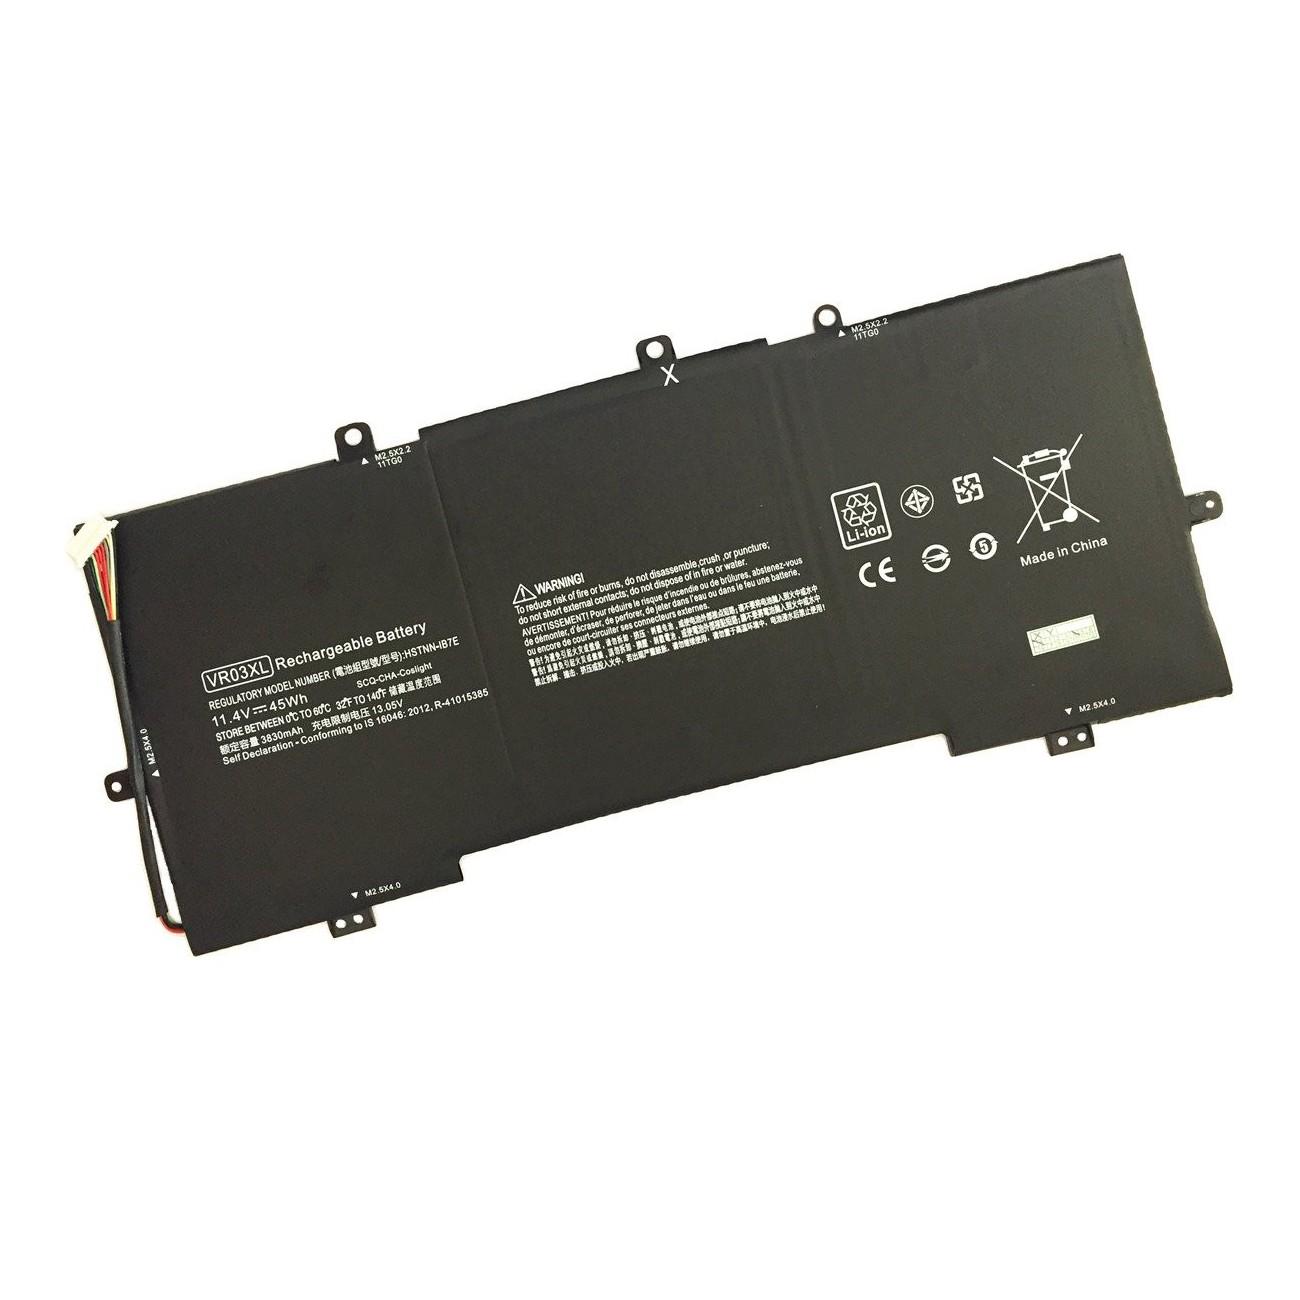 7XINbox 11.4V 45Wh 3950mAh VR03XL Repuesto Batería para HP Envy